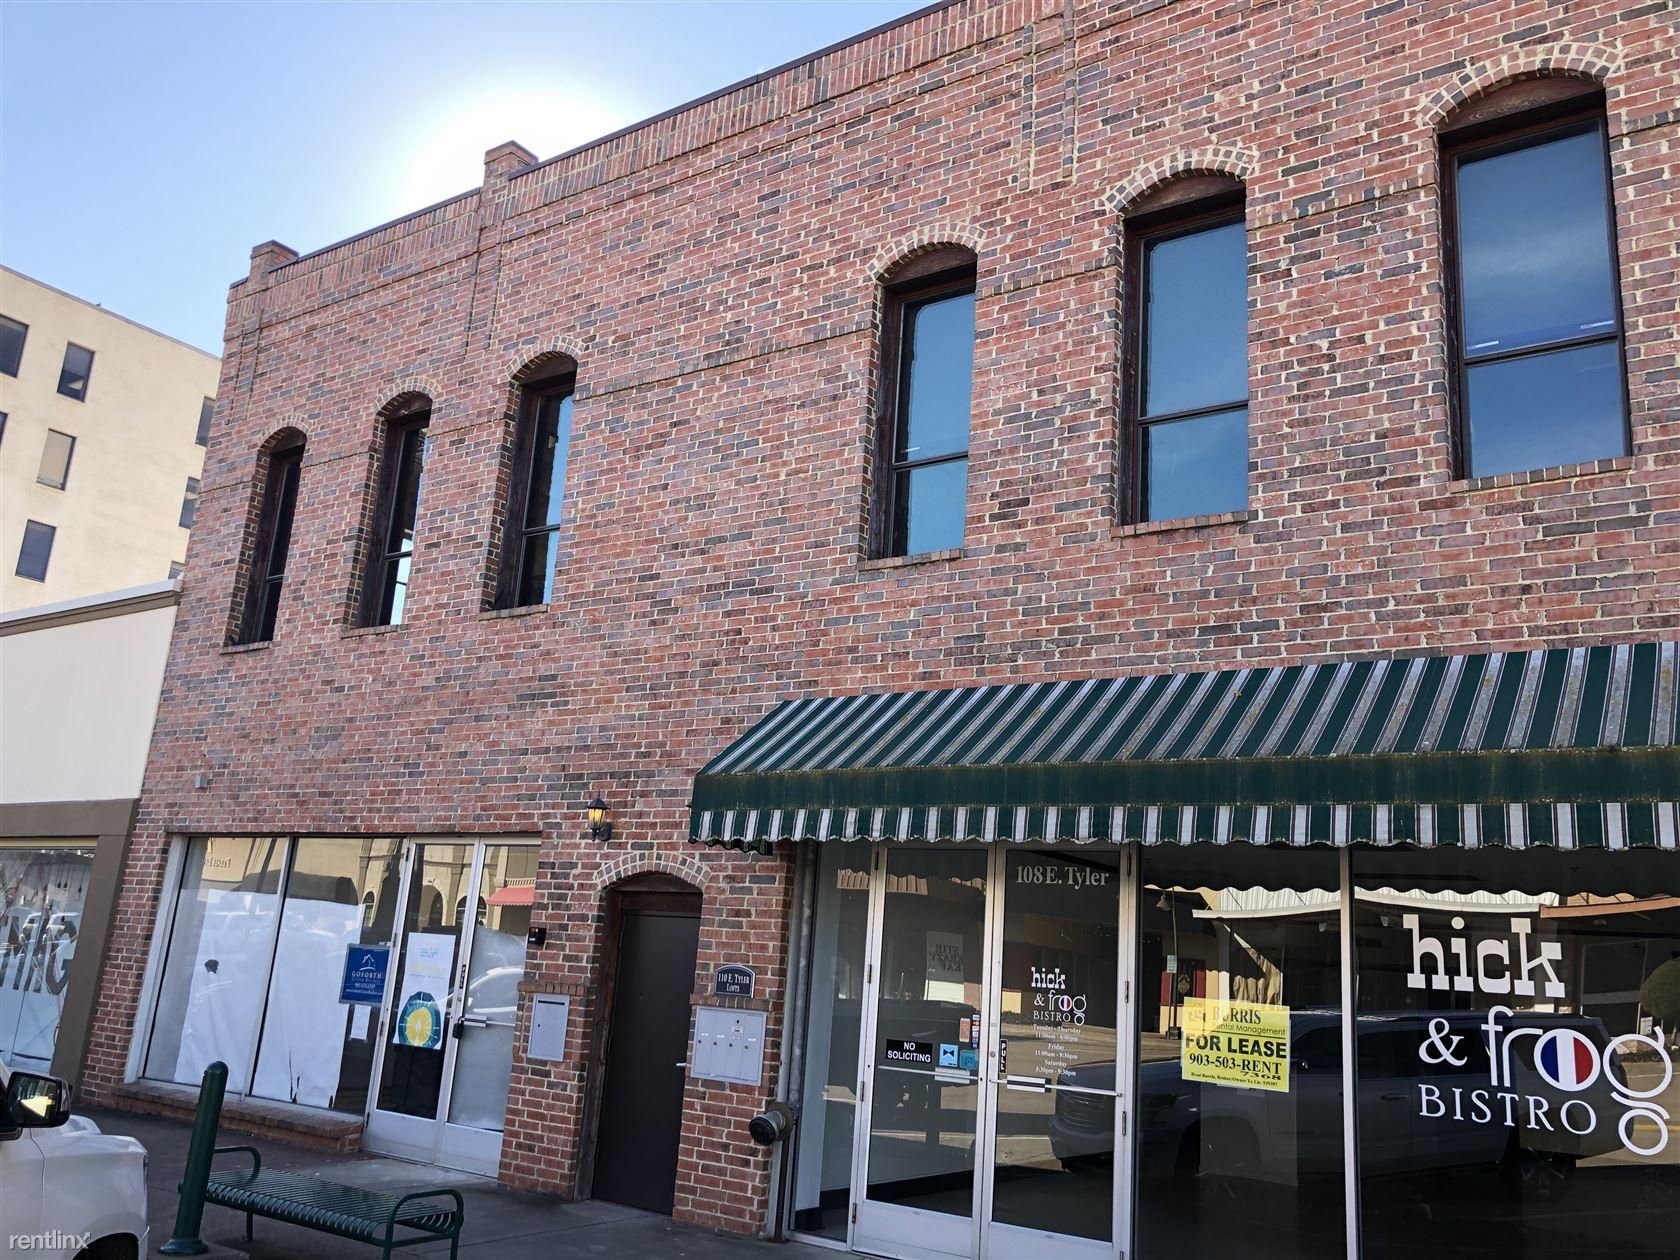 110 E Tyler St, Longview, TX - $100